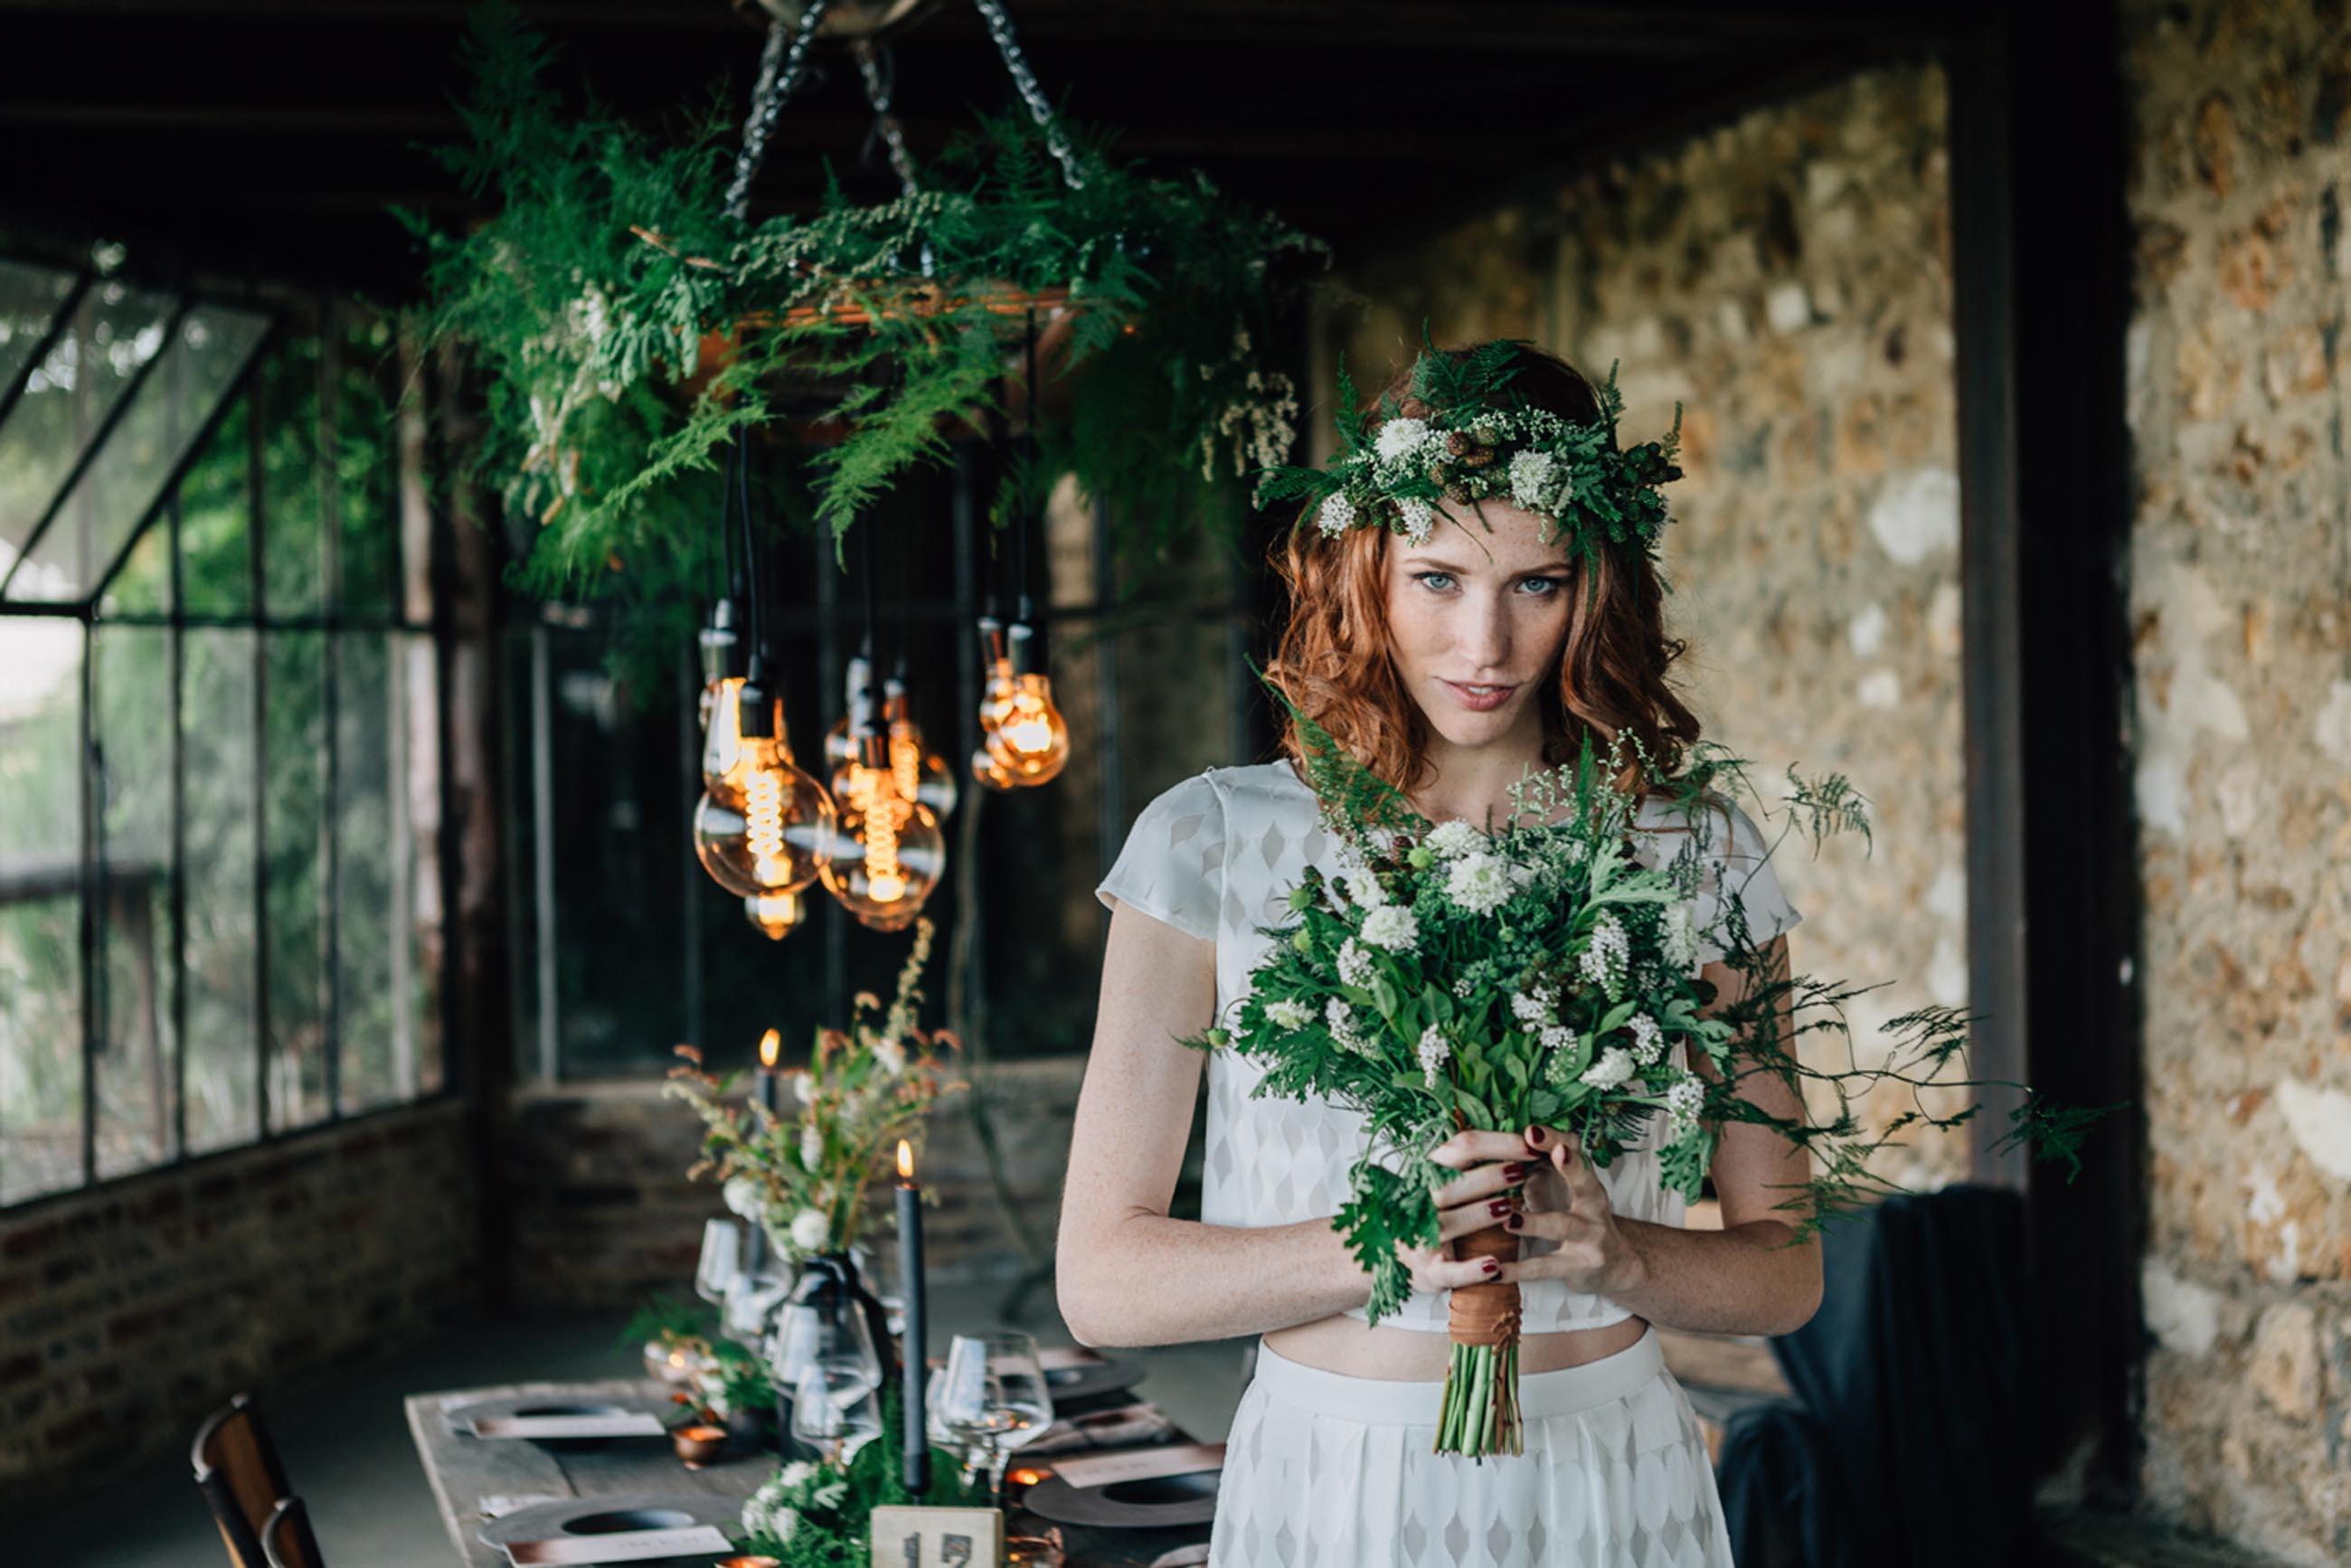 pierreatelier-photographe-mariage-paris-lesbonesjoies-wedding-photographer-elopement-138_1